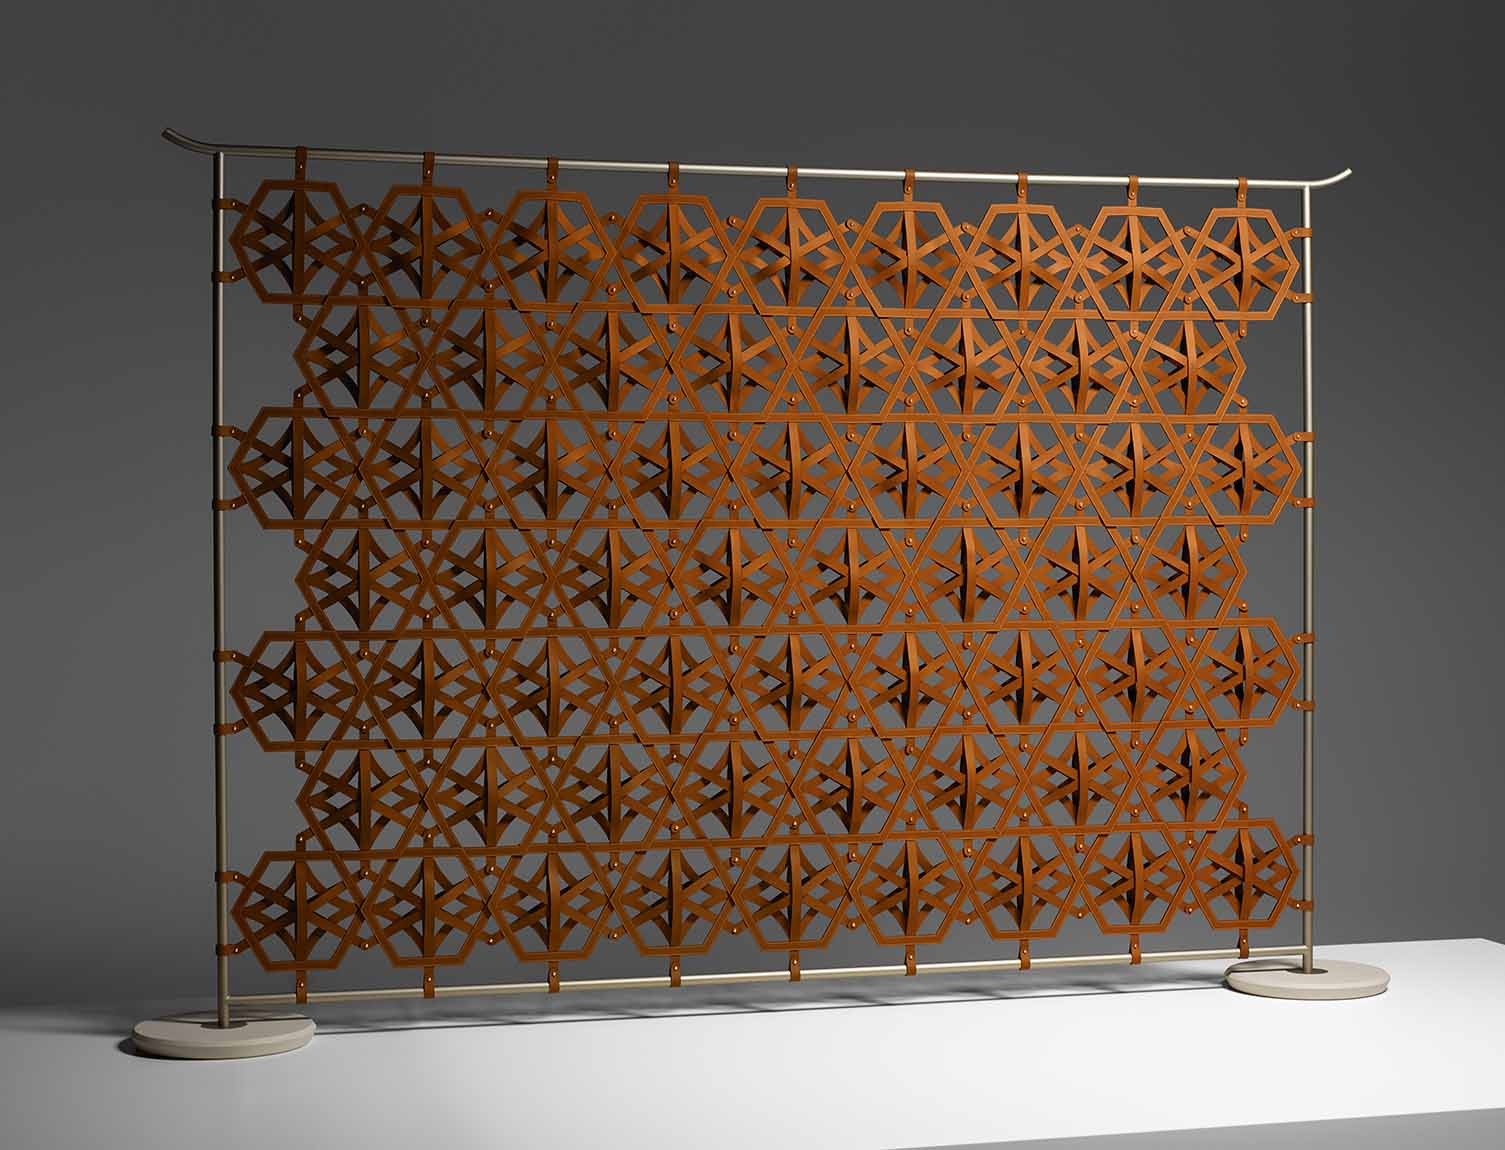 Louis Vuiton Muebles - Los 10 Nuevos Dise Os De Louis Vuitton Arquitectura Dise O [mjhdah]https://s-media-cache-ak0.pinimg.com/originals/31/23/80/3123802d5f8f714a6339e20516bf6f11.jpg